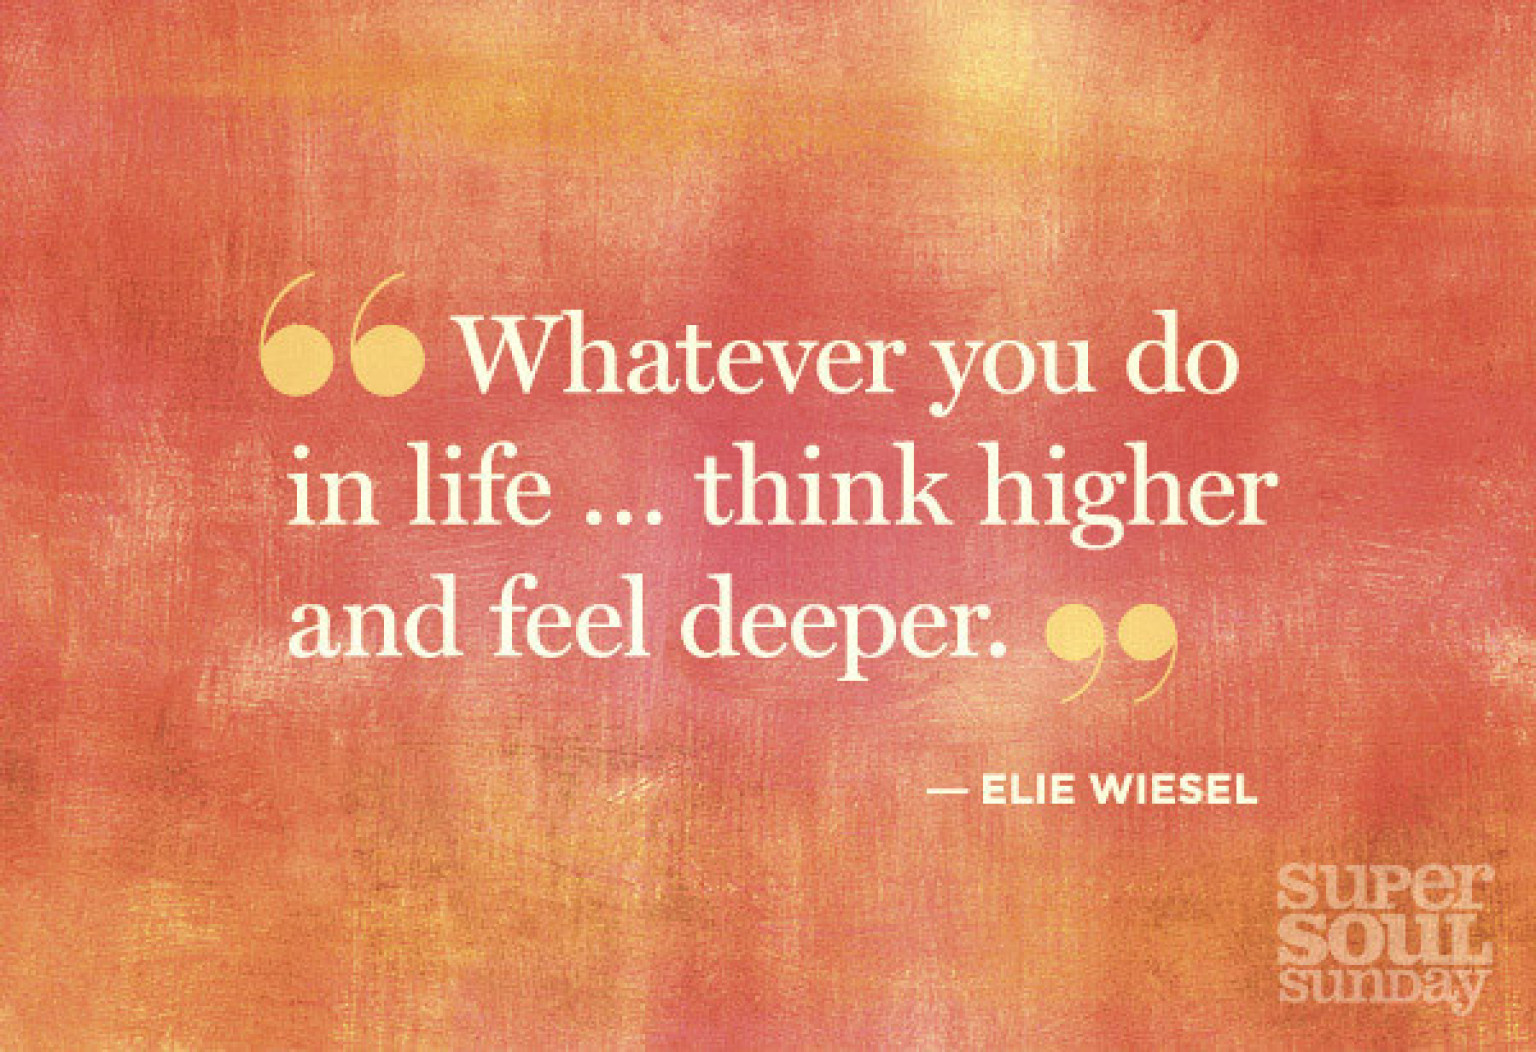 Insights From Deepak Chopra Elie Wiesel And Other Spiritual Leaders